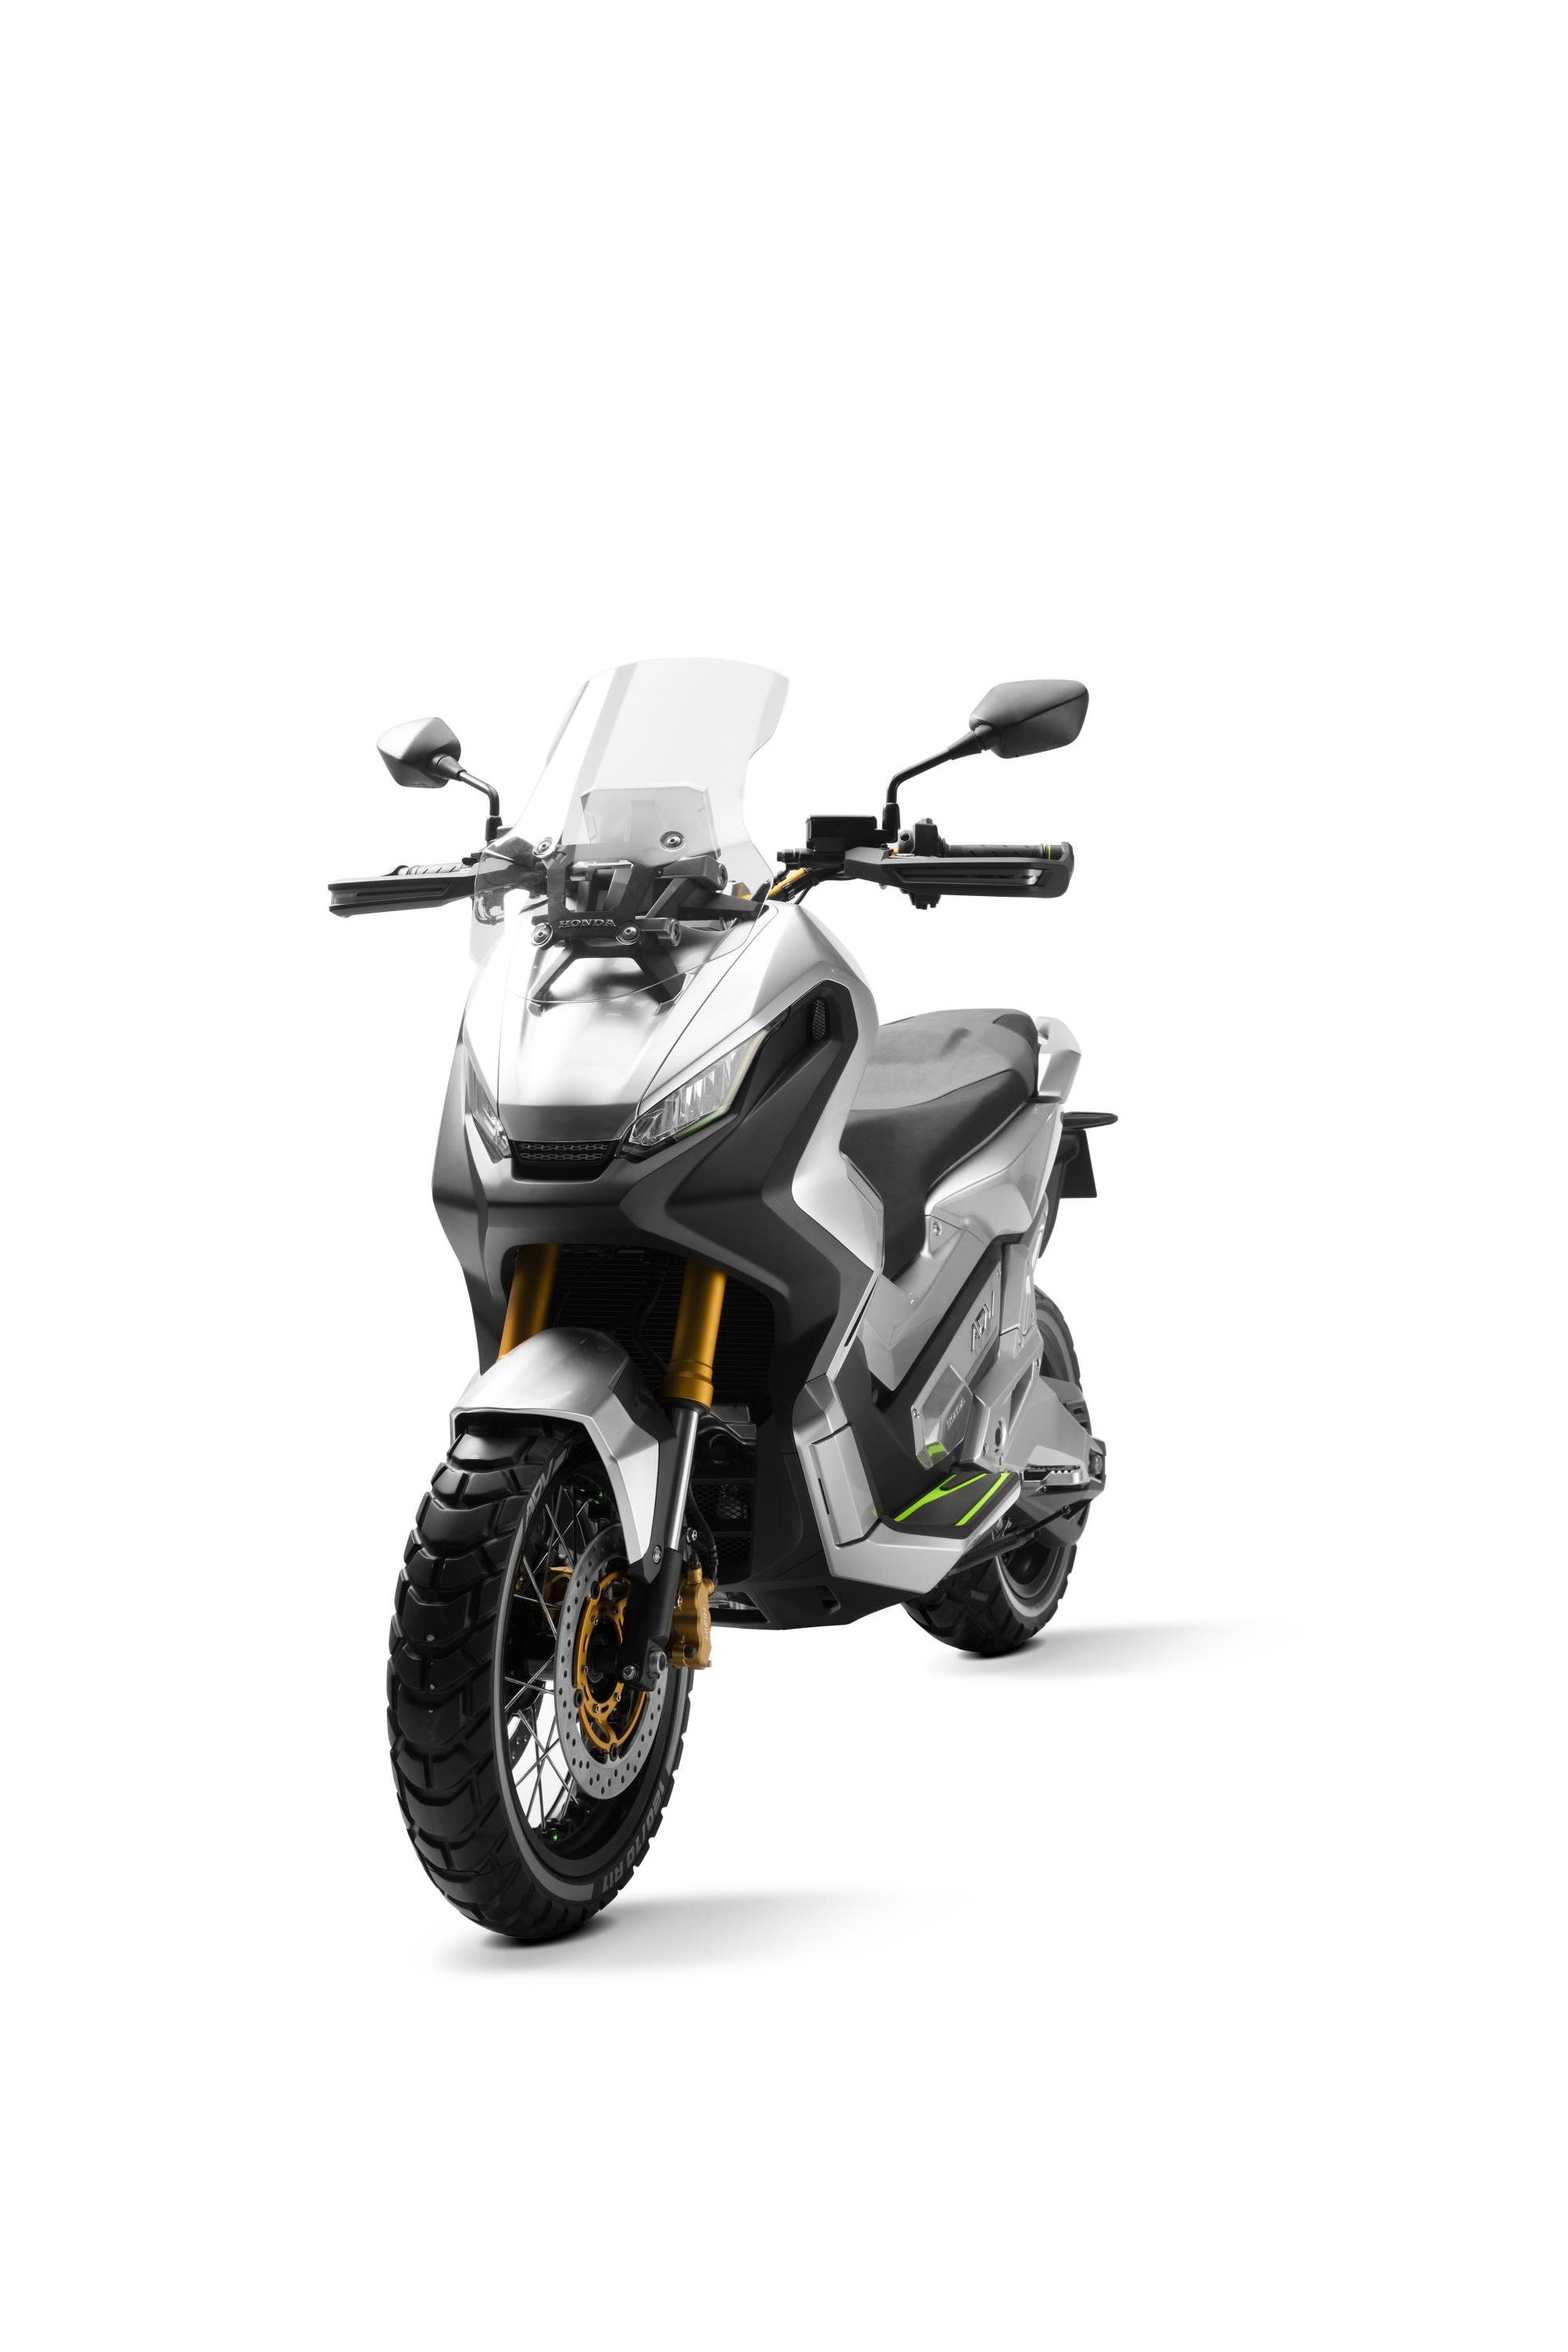 Honda shows new 'City Adventure' concept at Eicma